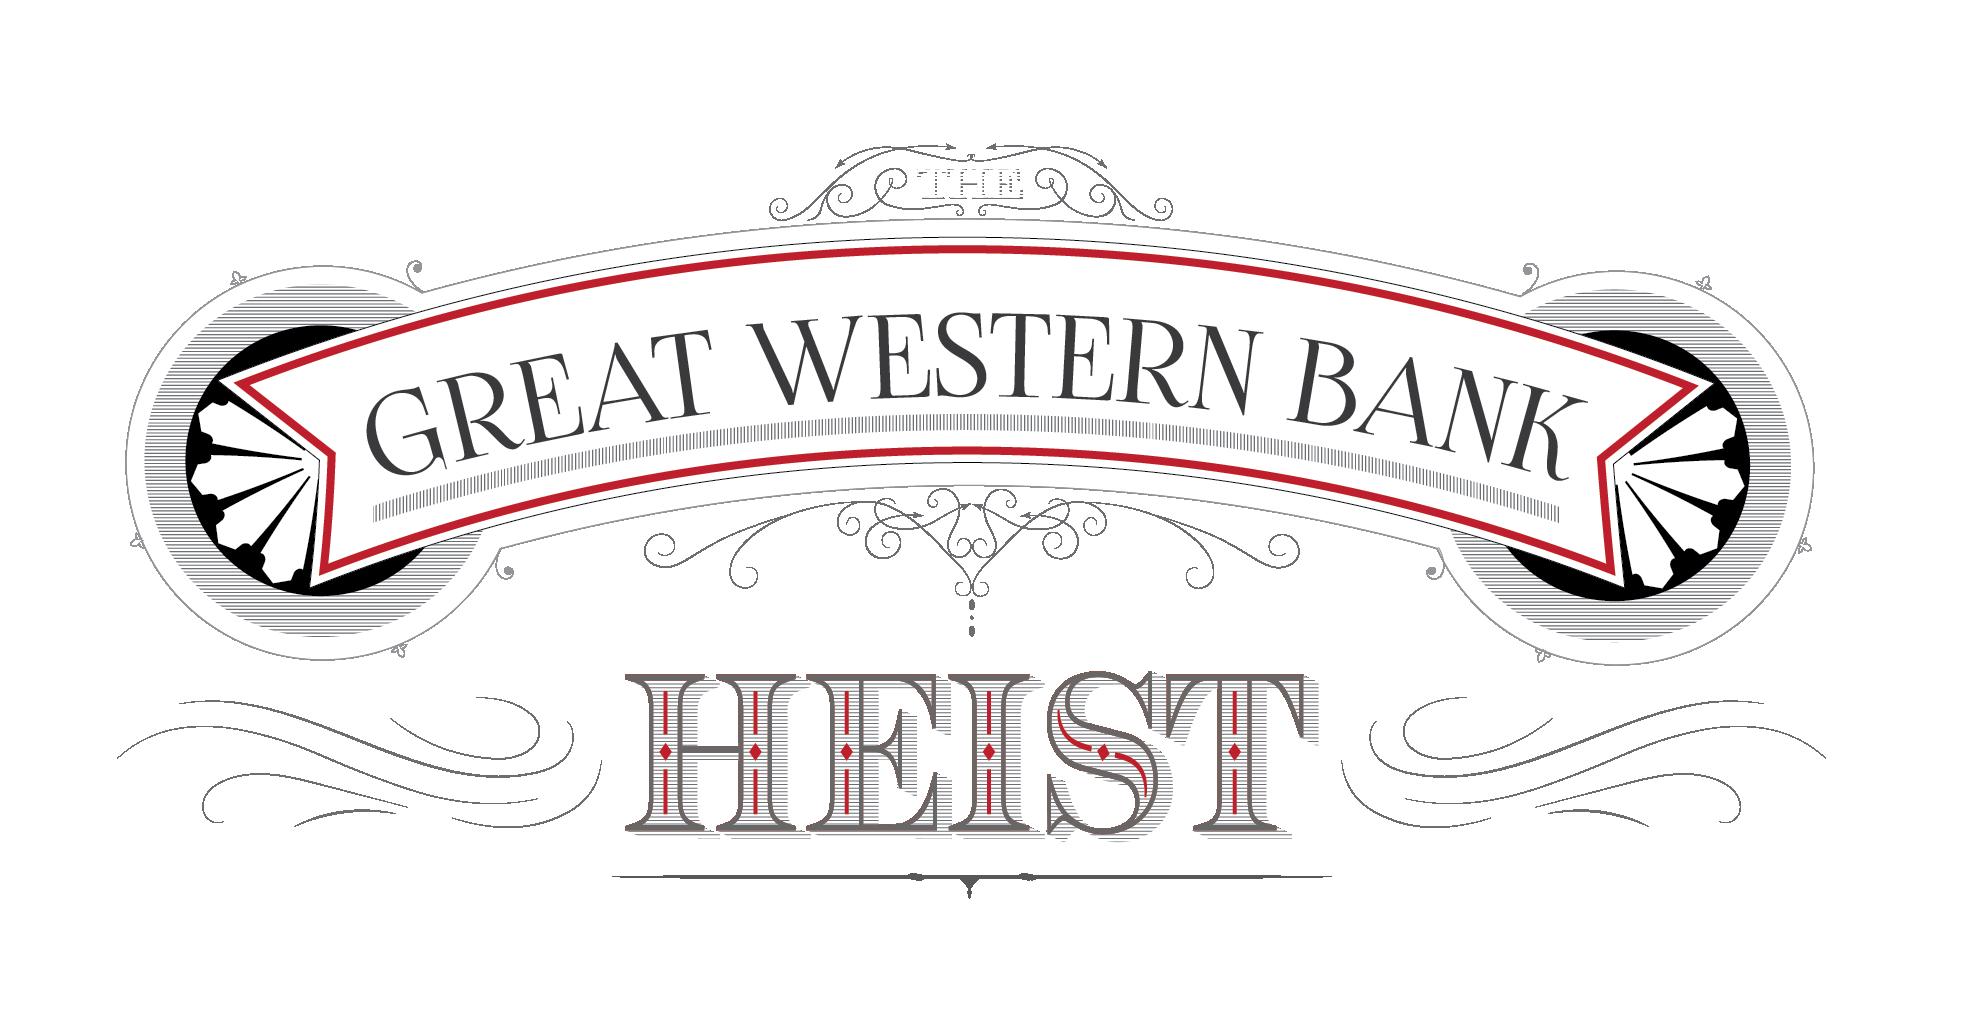 Escape Artists - Halifax, Nova Scotia - The Games - The Great Western Bank Heist